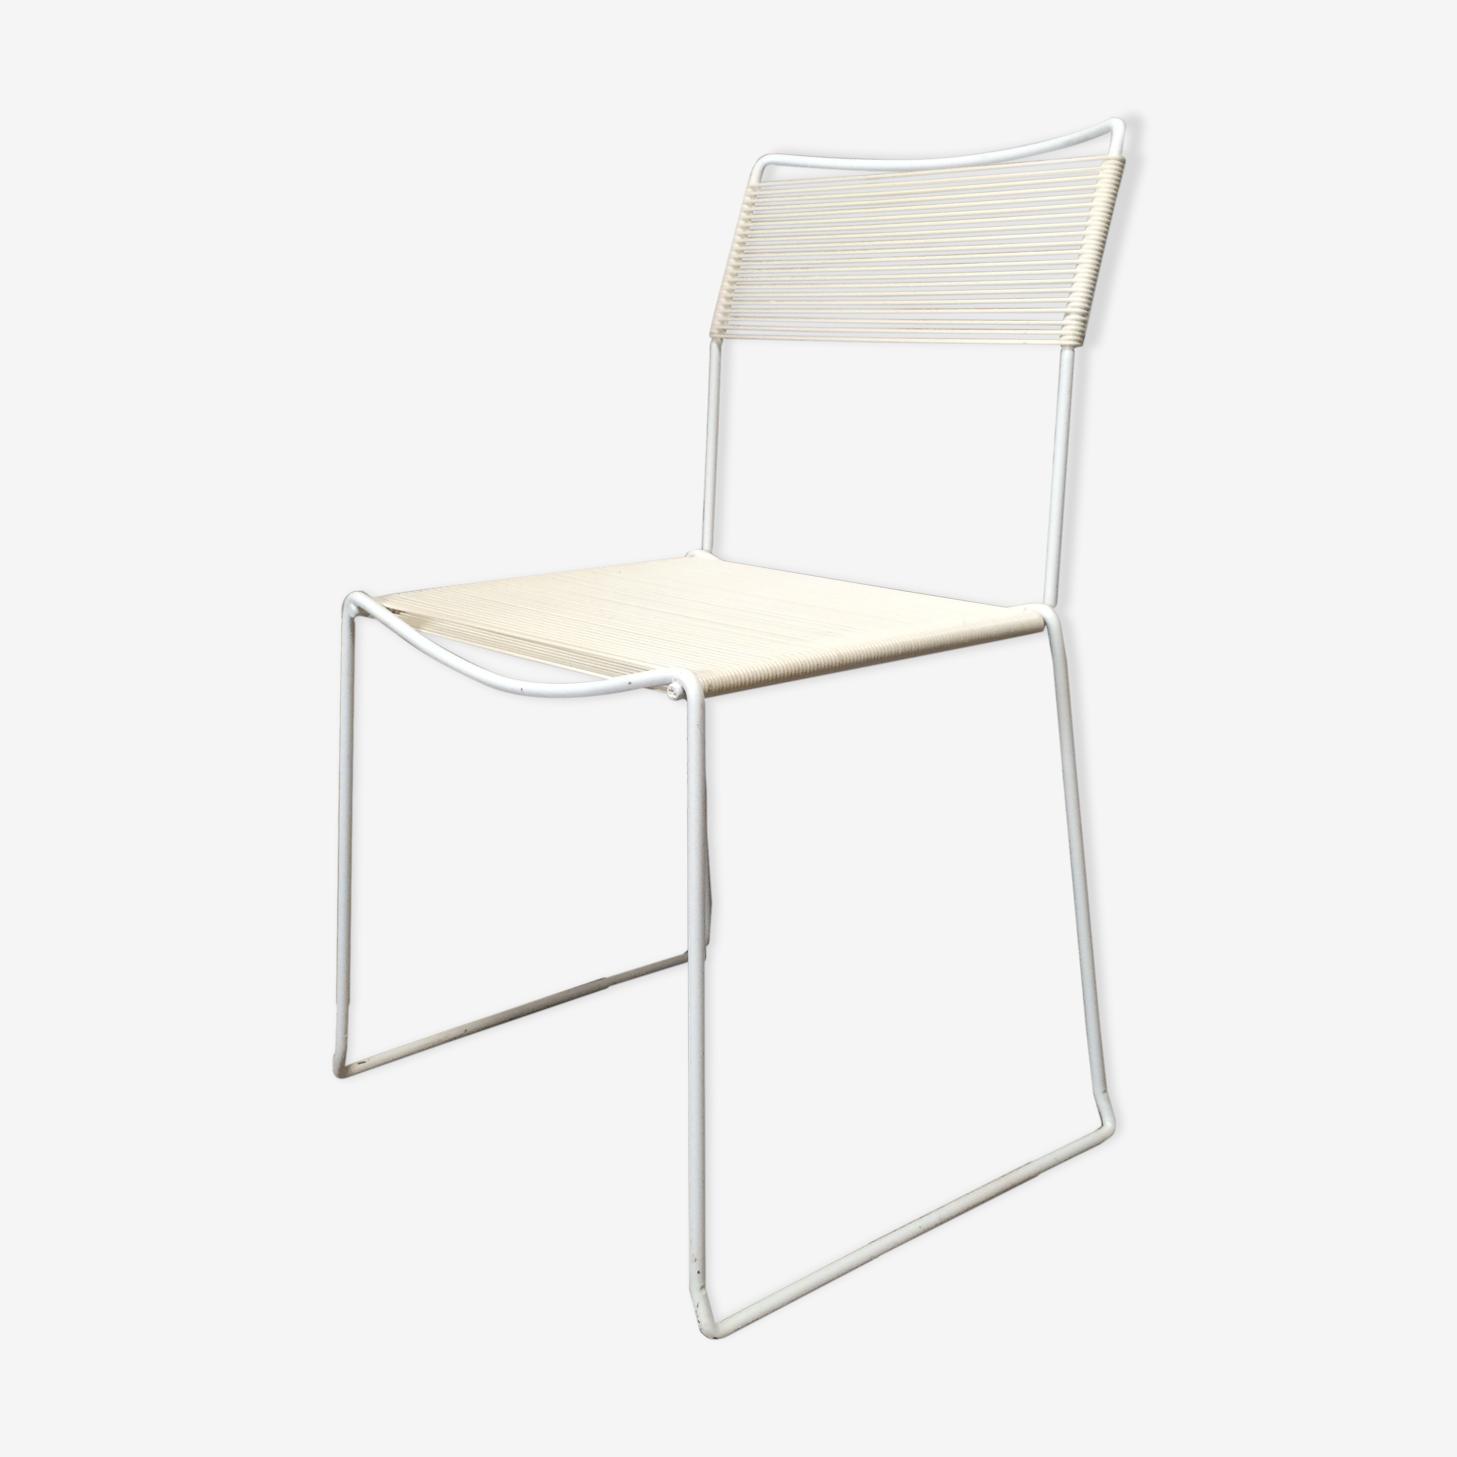 Spaguetti scoubidou vintage Chair